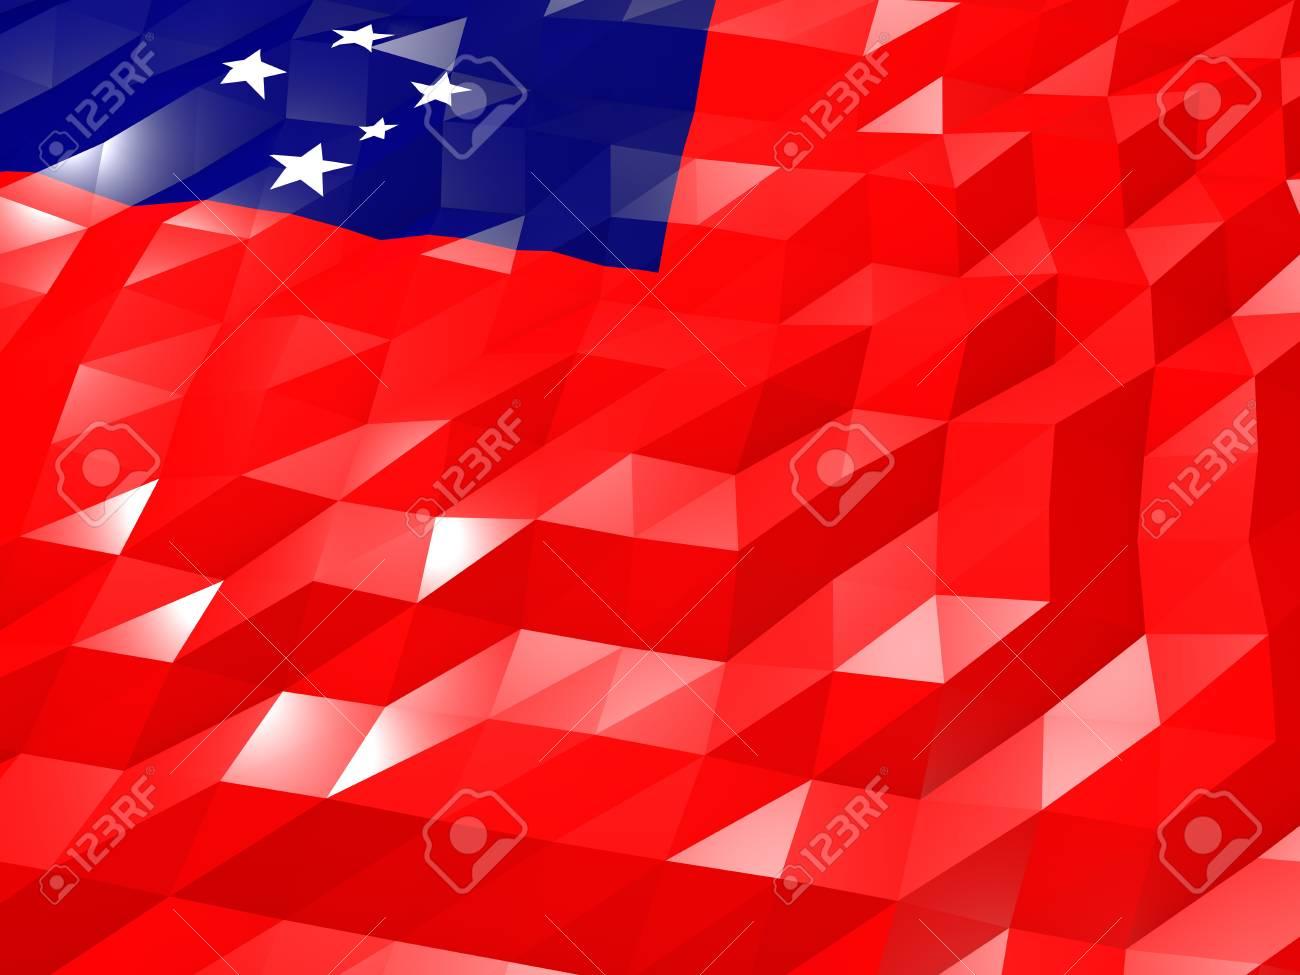 Flag Of Samoa 3D Wallpaper Illustration National Symbol Low Polygonal Glossy Origami Style Stock